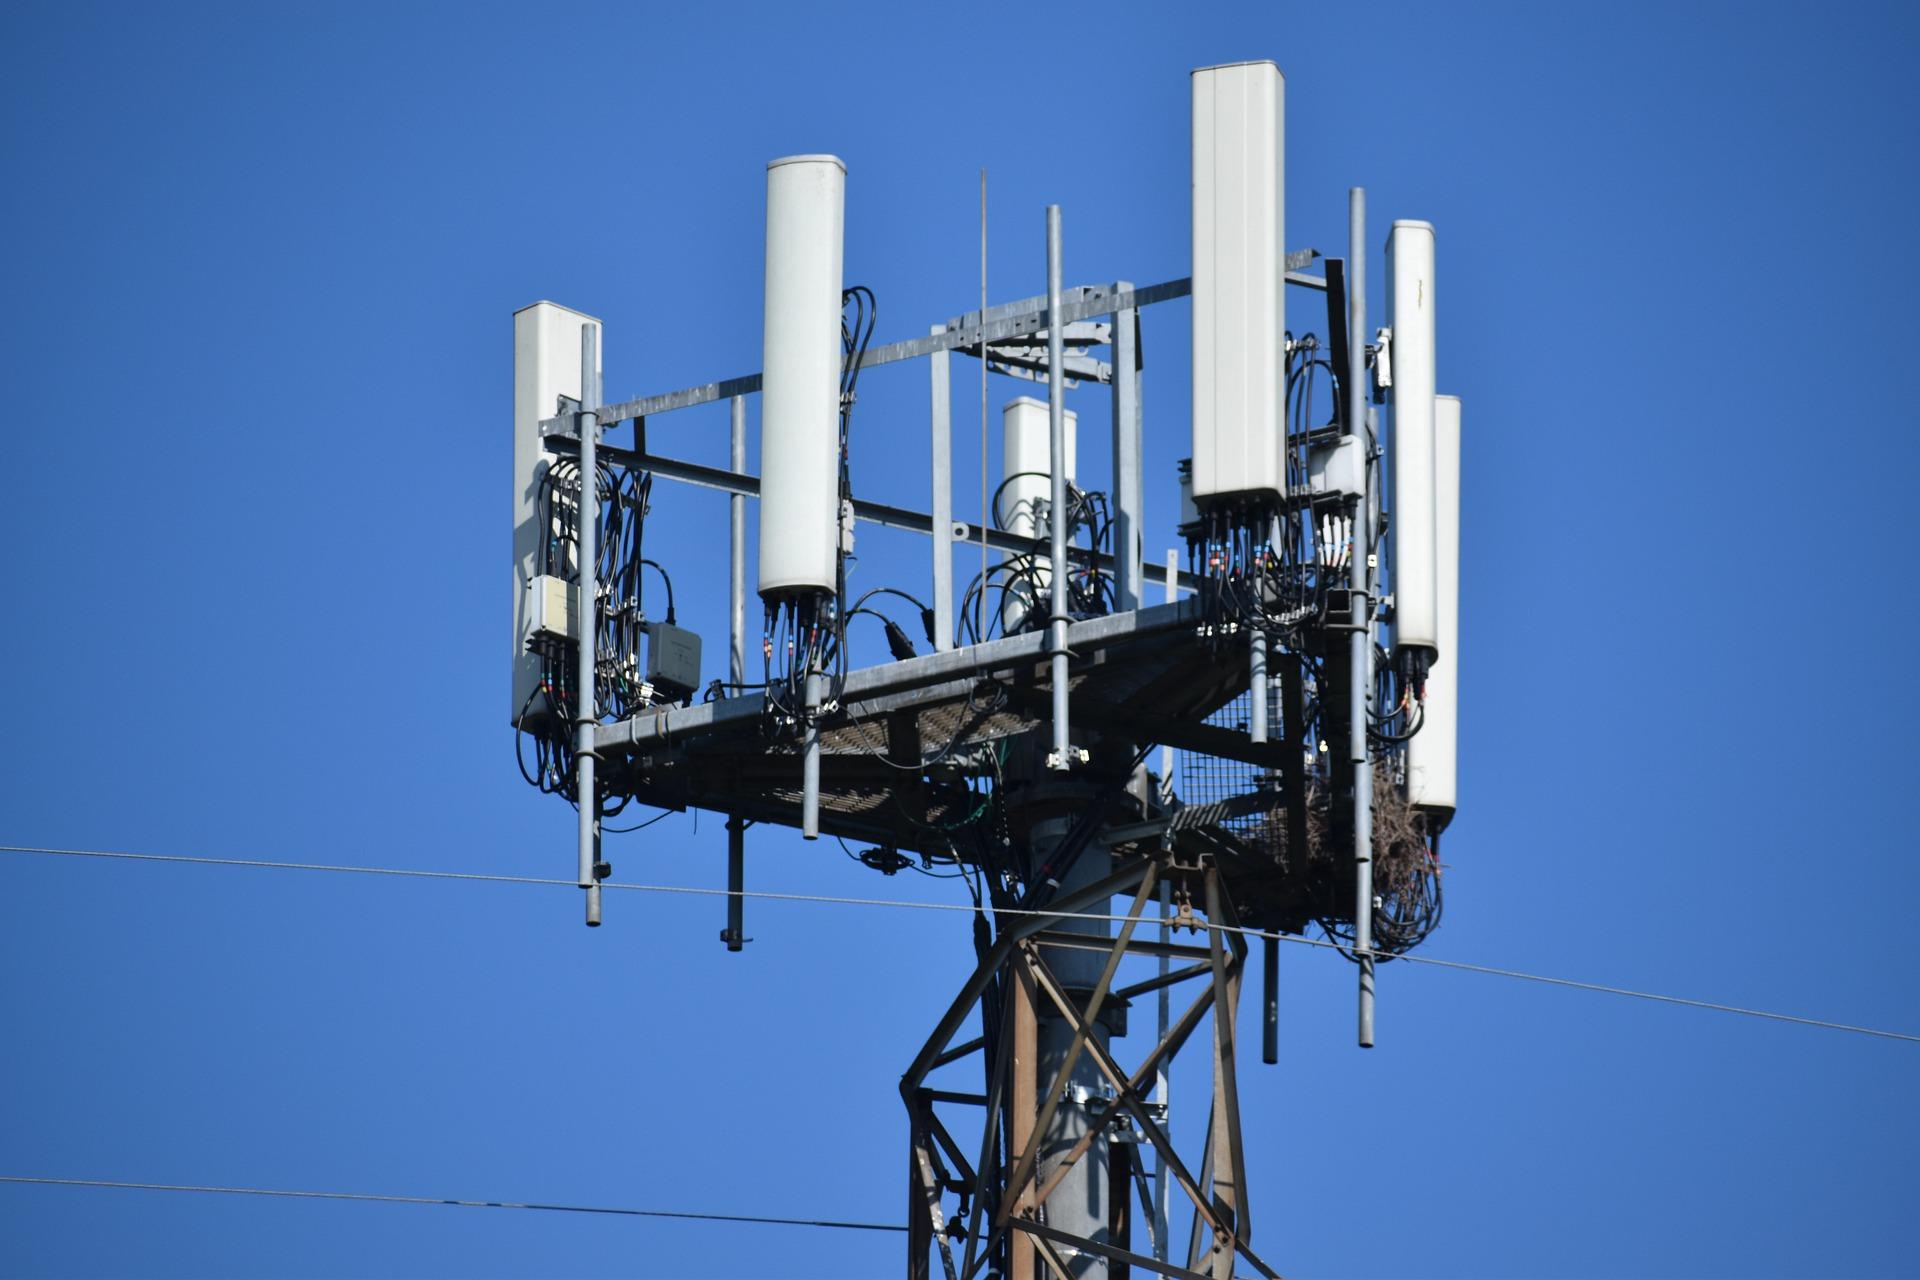 Maszt sieci 5G